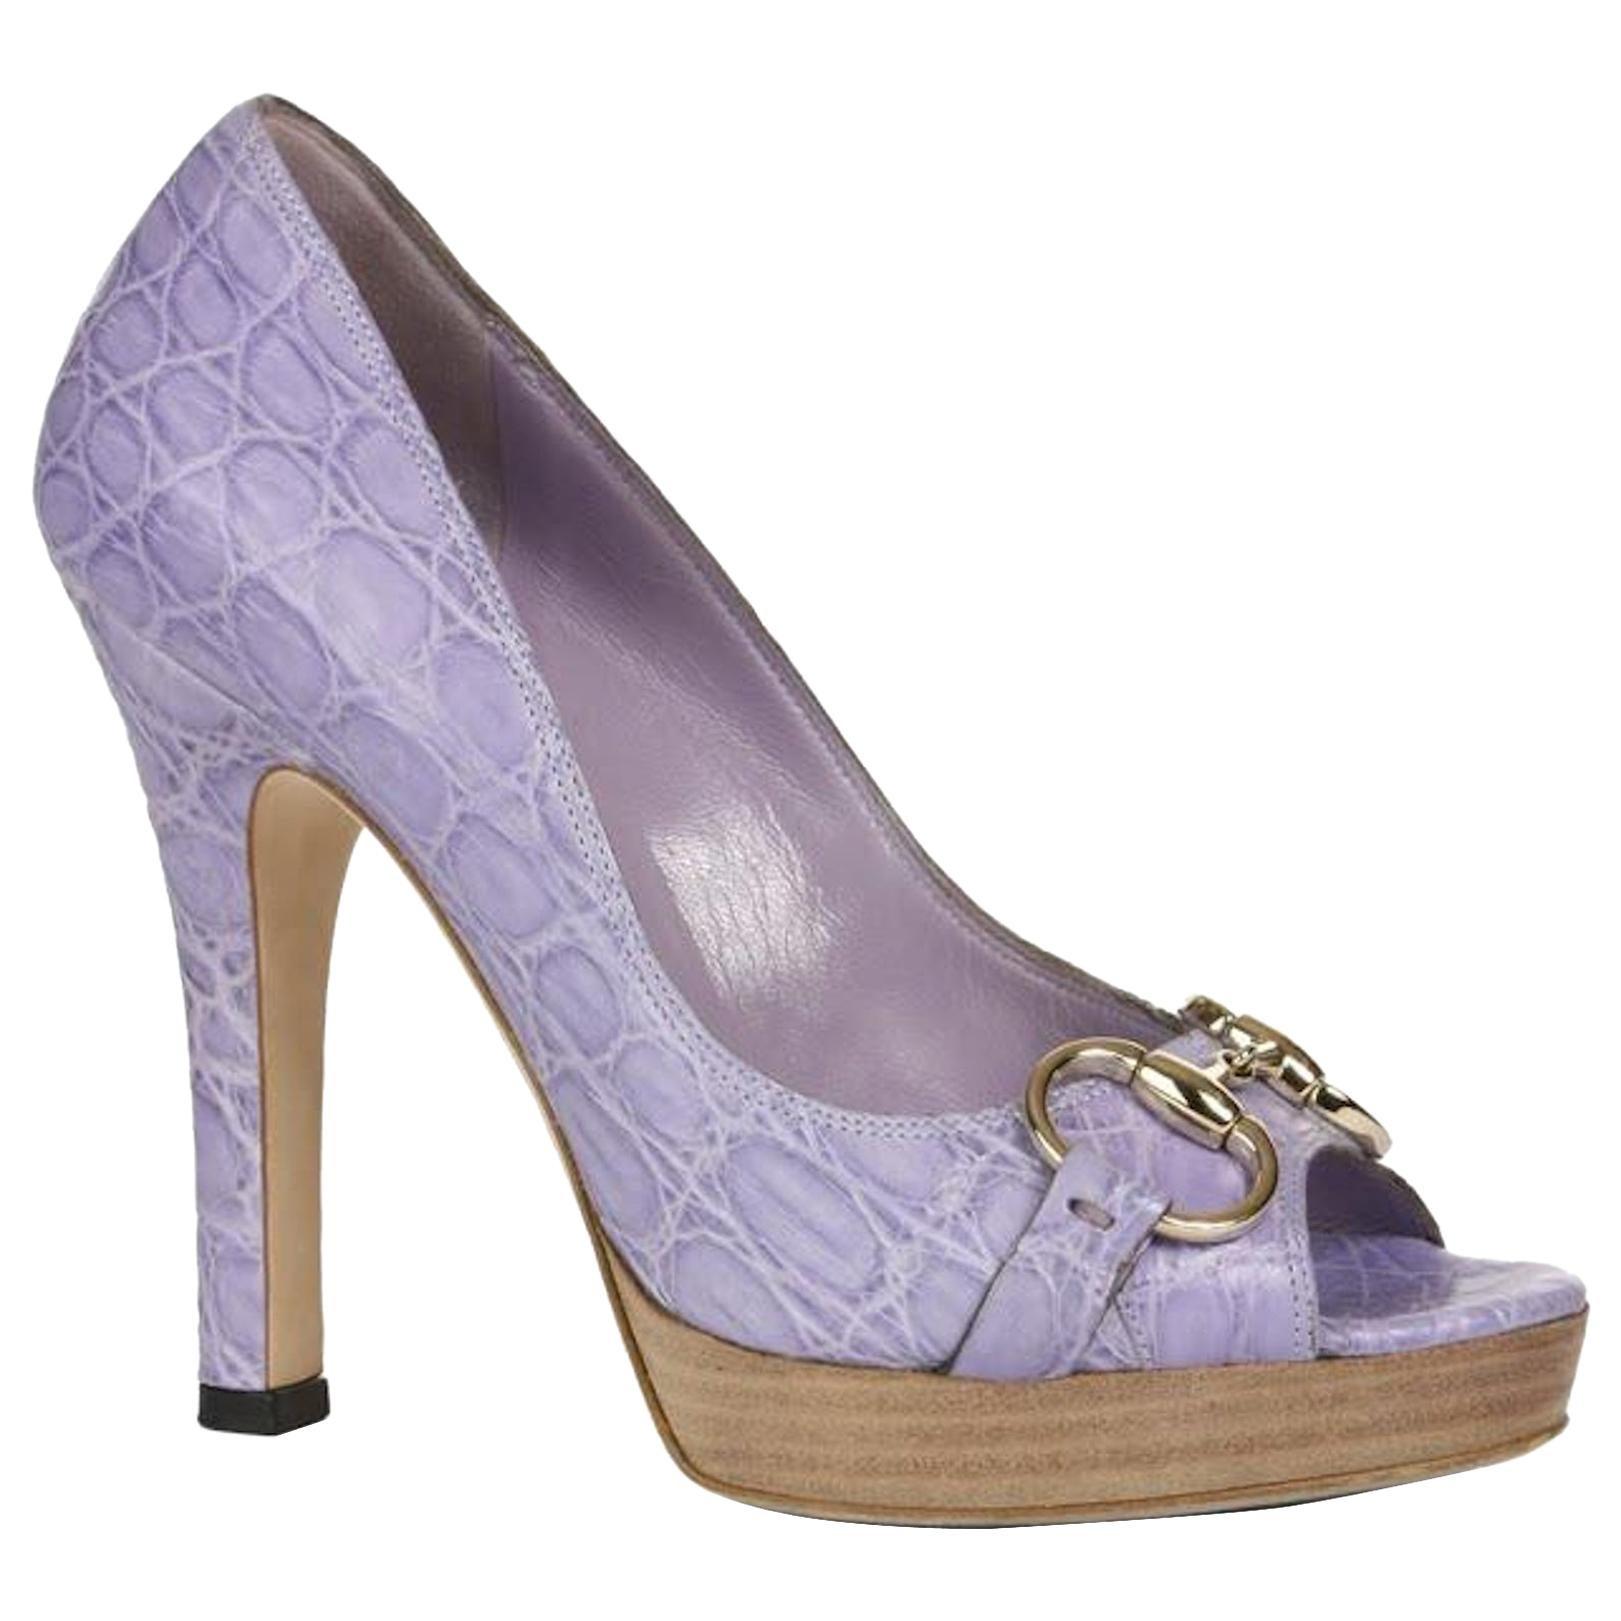 NEW Lilac Gucci Horsebit Exotic Crocodile Peep Toe High Heels Sandals